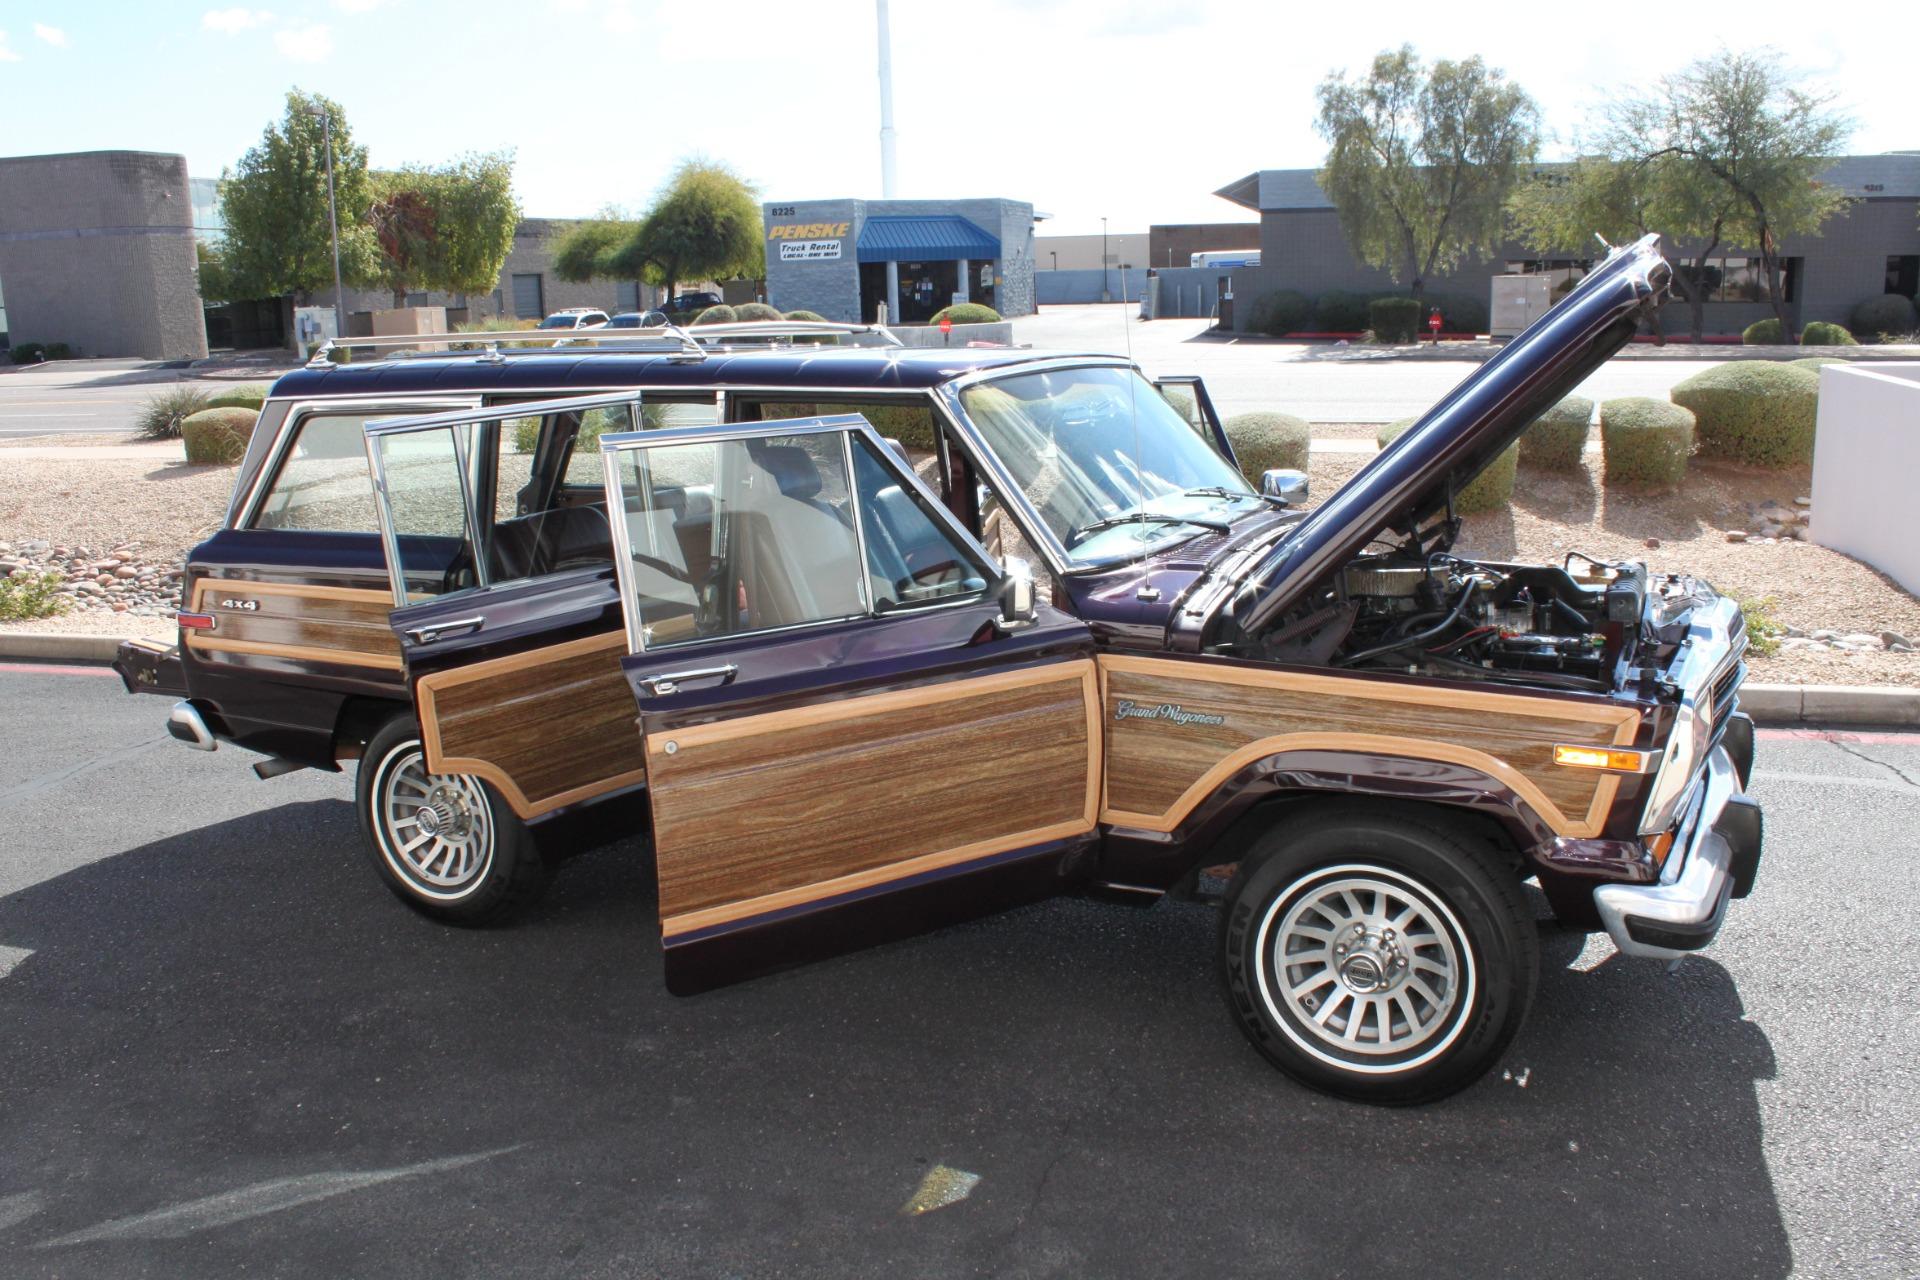 Used-1989-Jeep-Grand-Wagoneer-Toyota